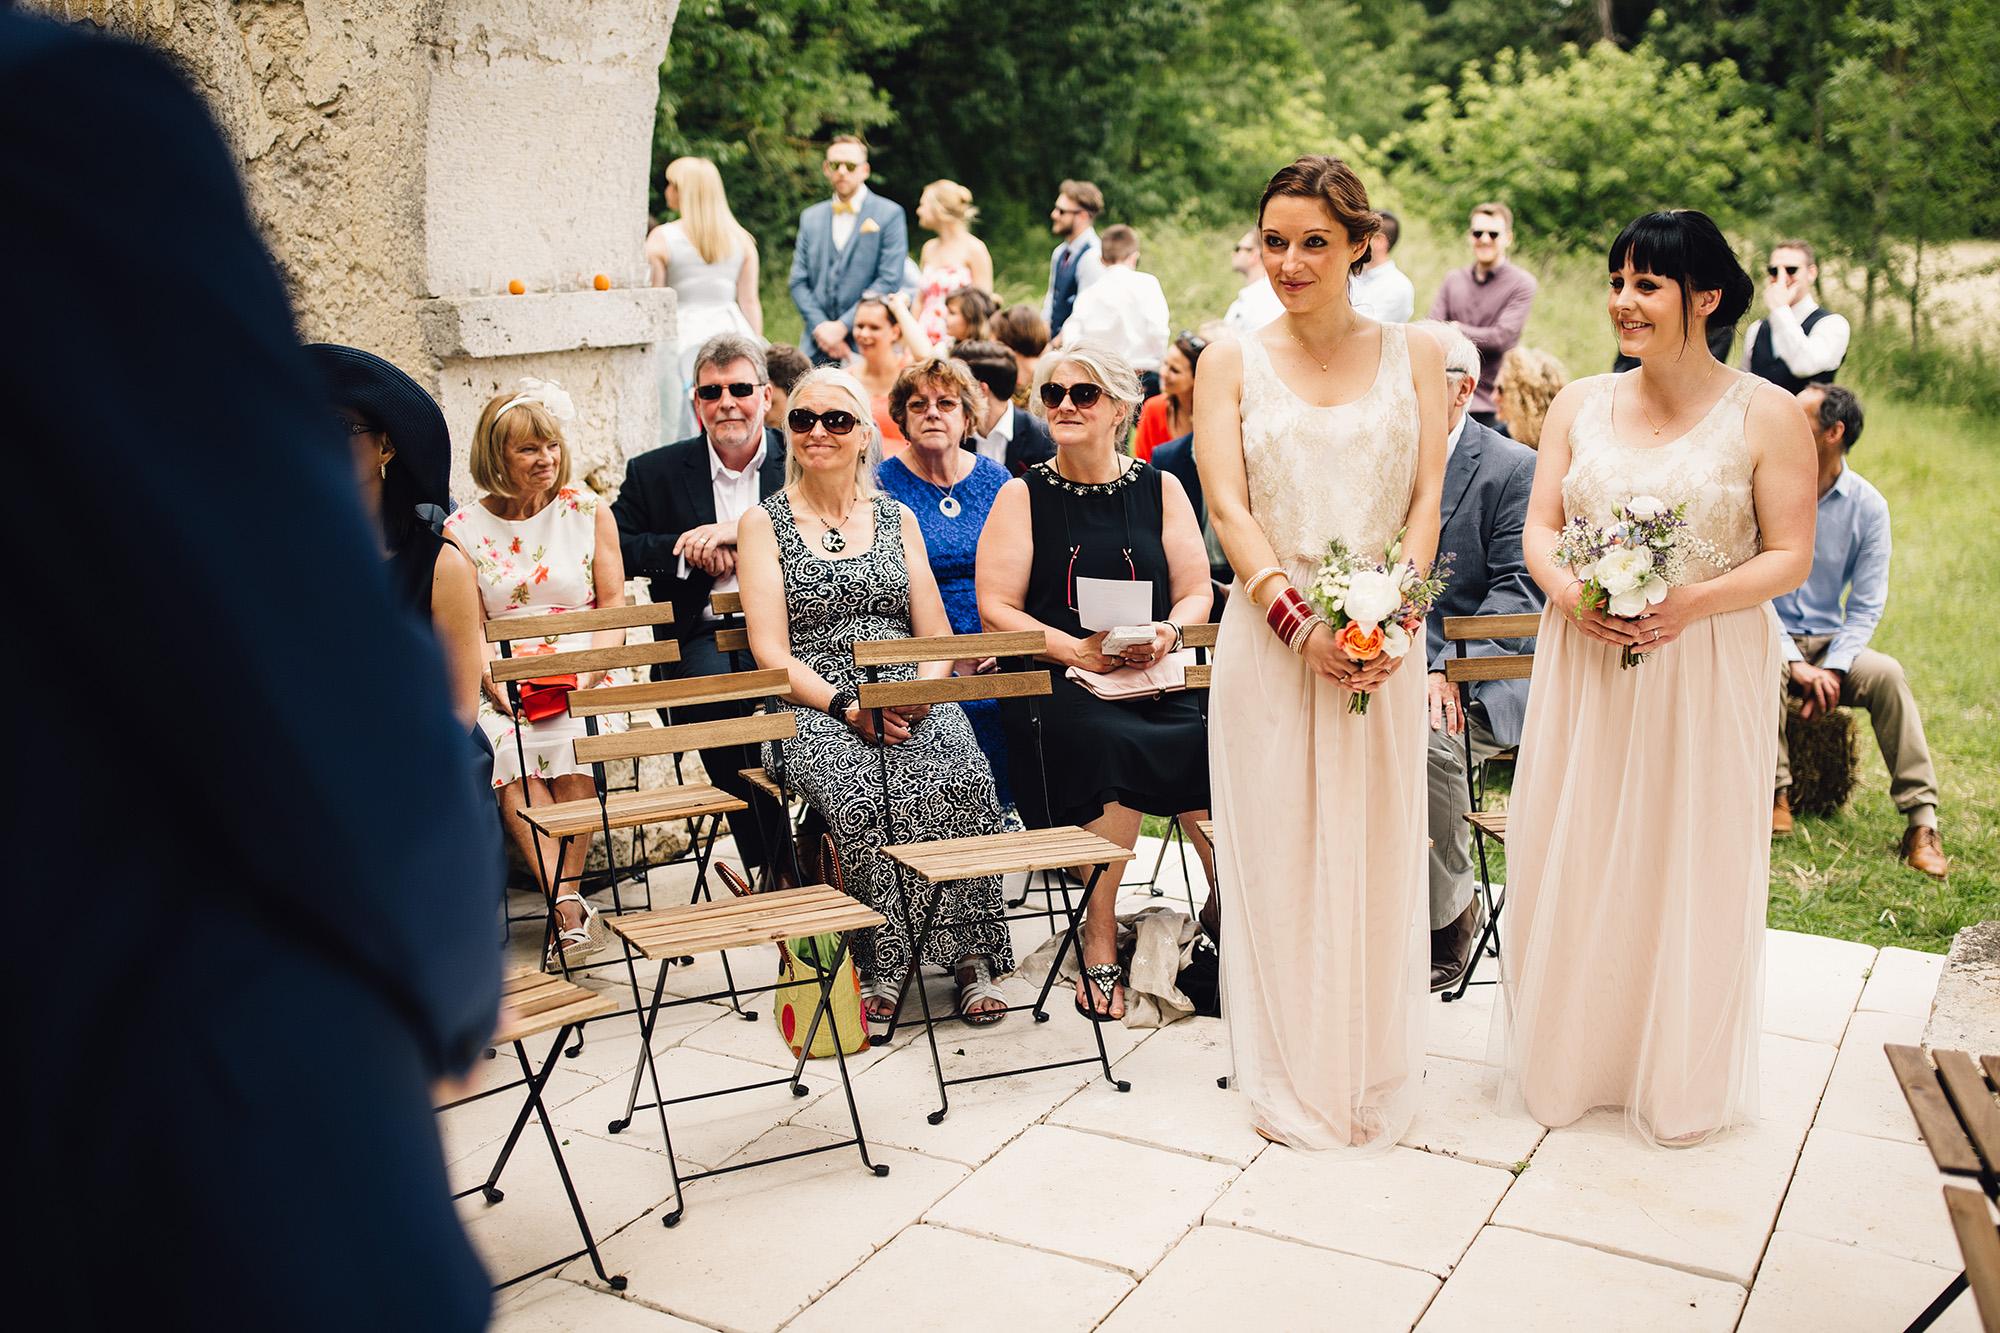 Hannah-Bespoke-Bridesmaids-Bohemian-French-Wedding-Gold-Lace-Susanna-Greening-Designs-Matlock-Derbyshire-10